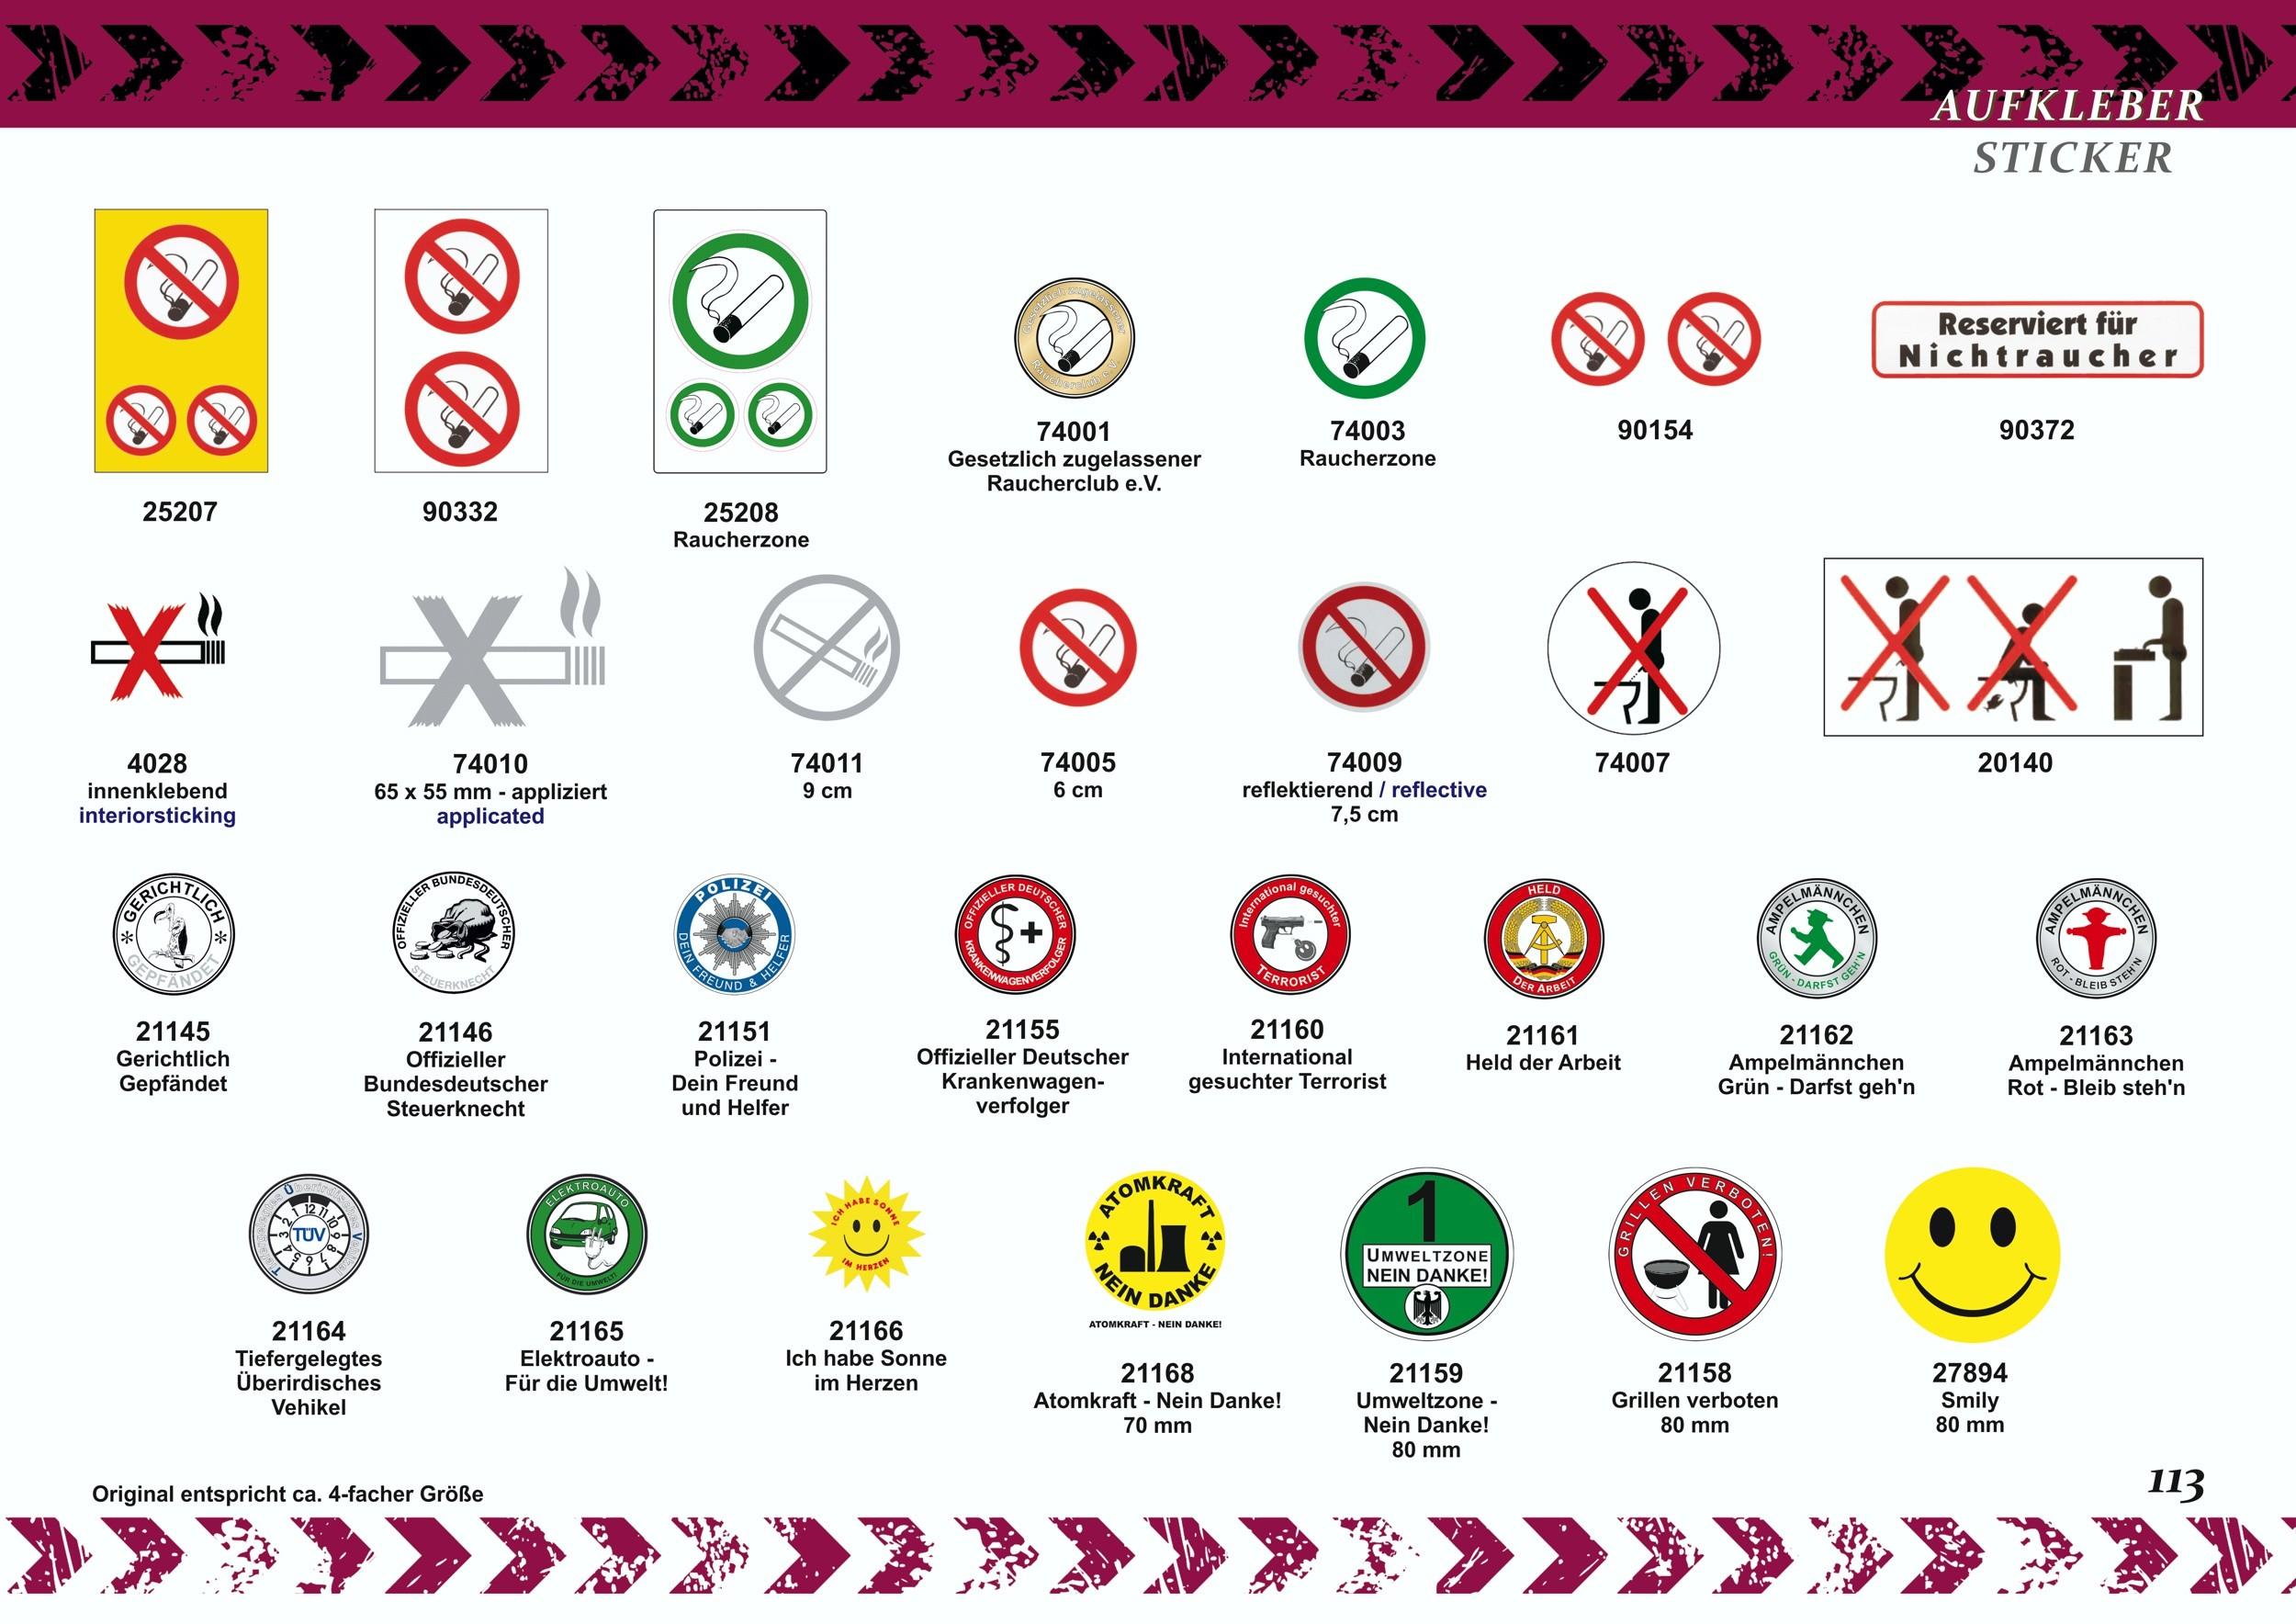 Autocollant Gesetzlich zugelassener Raucherclub e.V. 90 x 70 mm – Bild 4